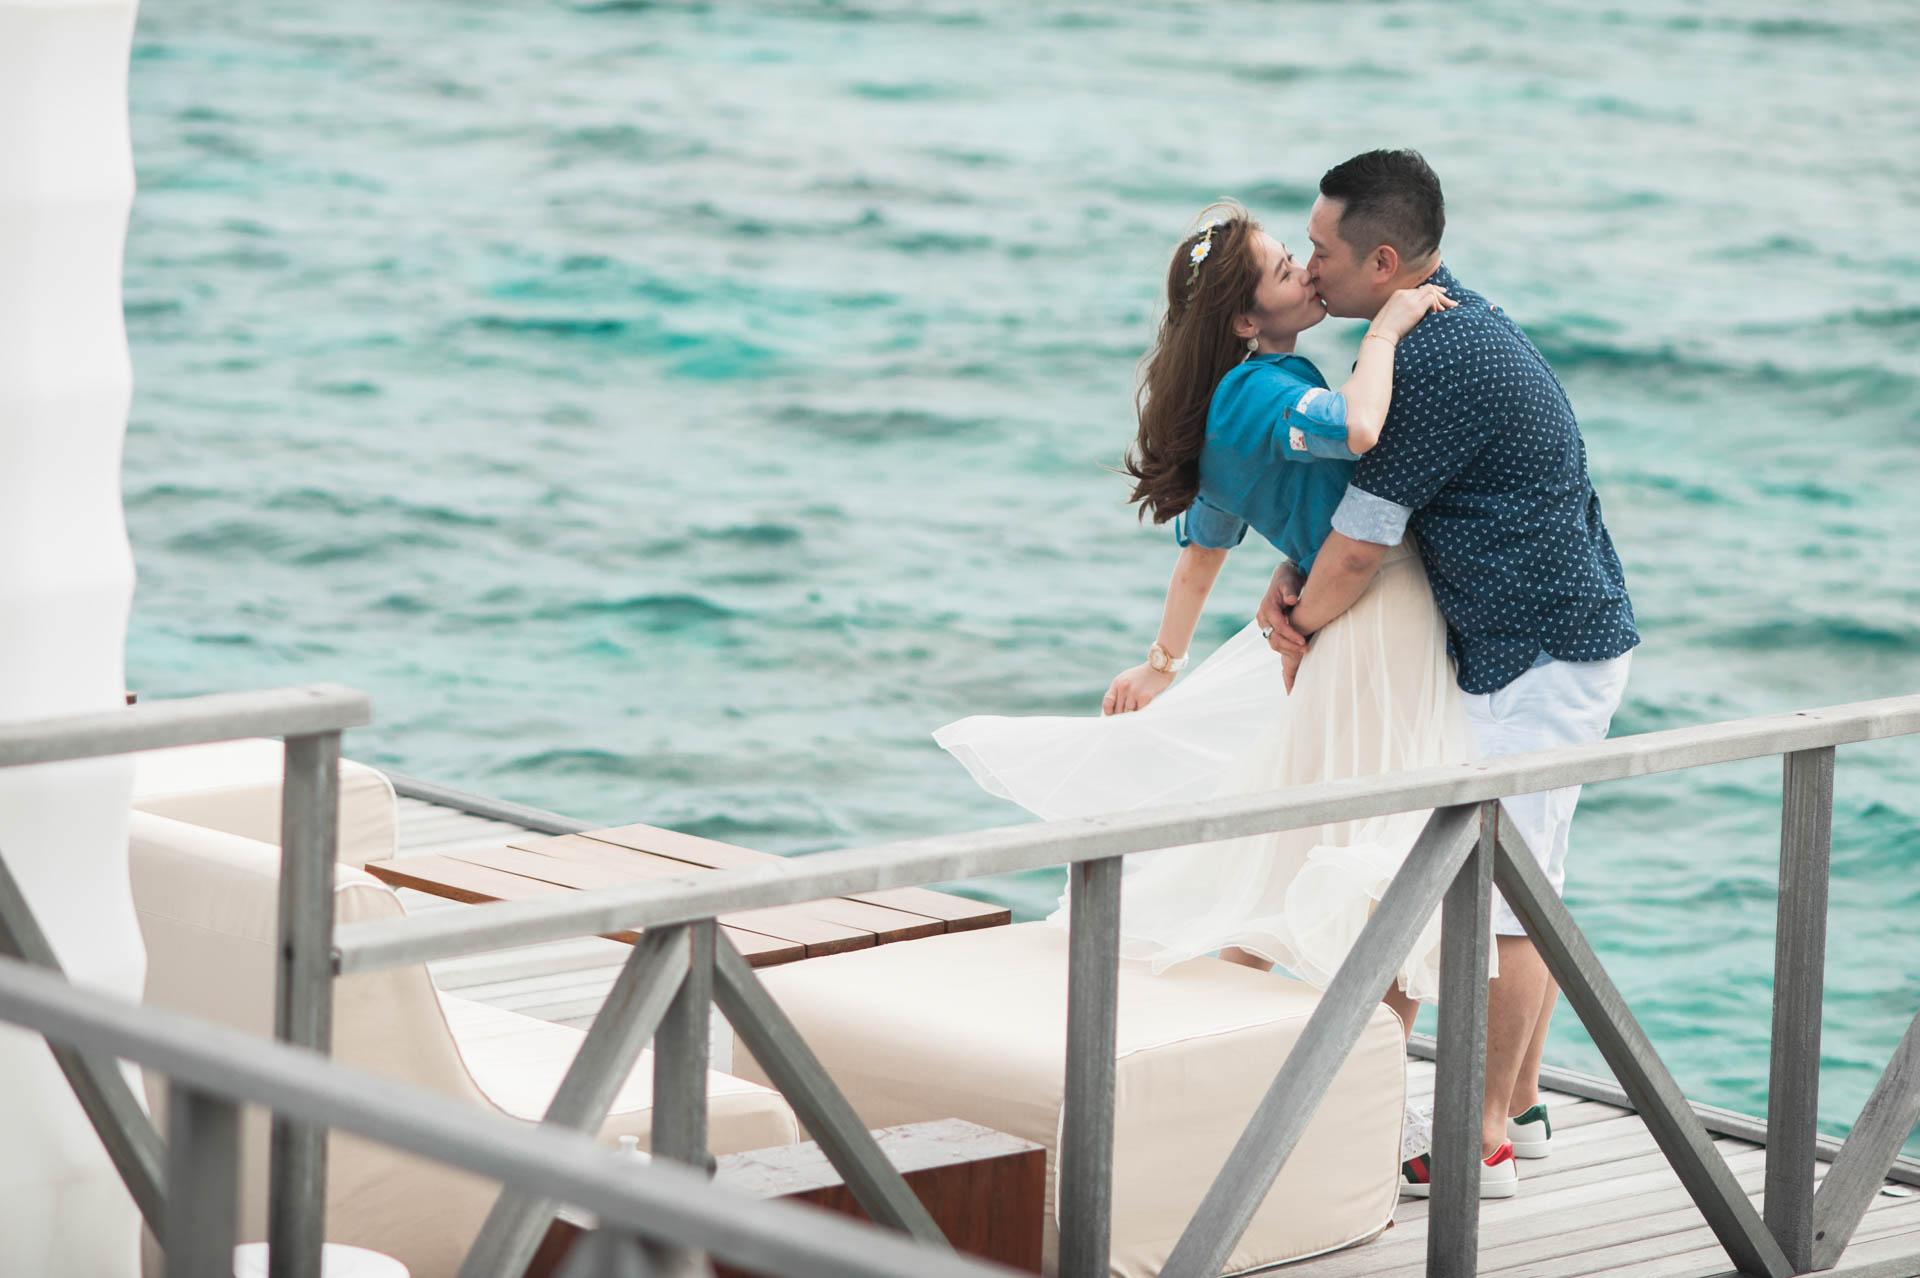 Chin Siew and Chin Yee Honeymoon in Maldives at Huvafen Fushi Resort Under Water Spa 40